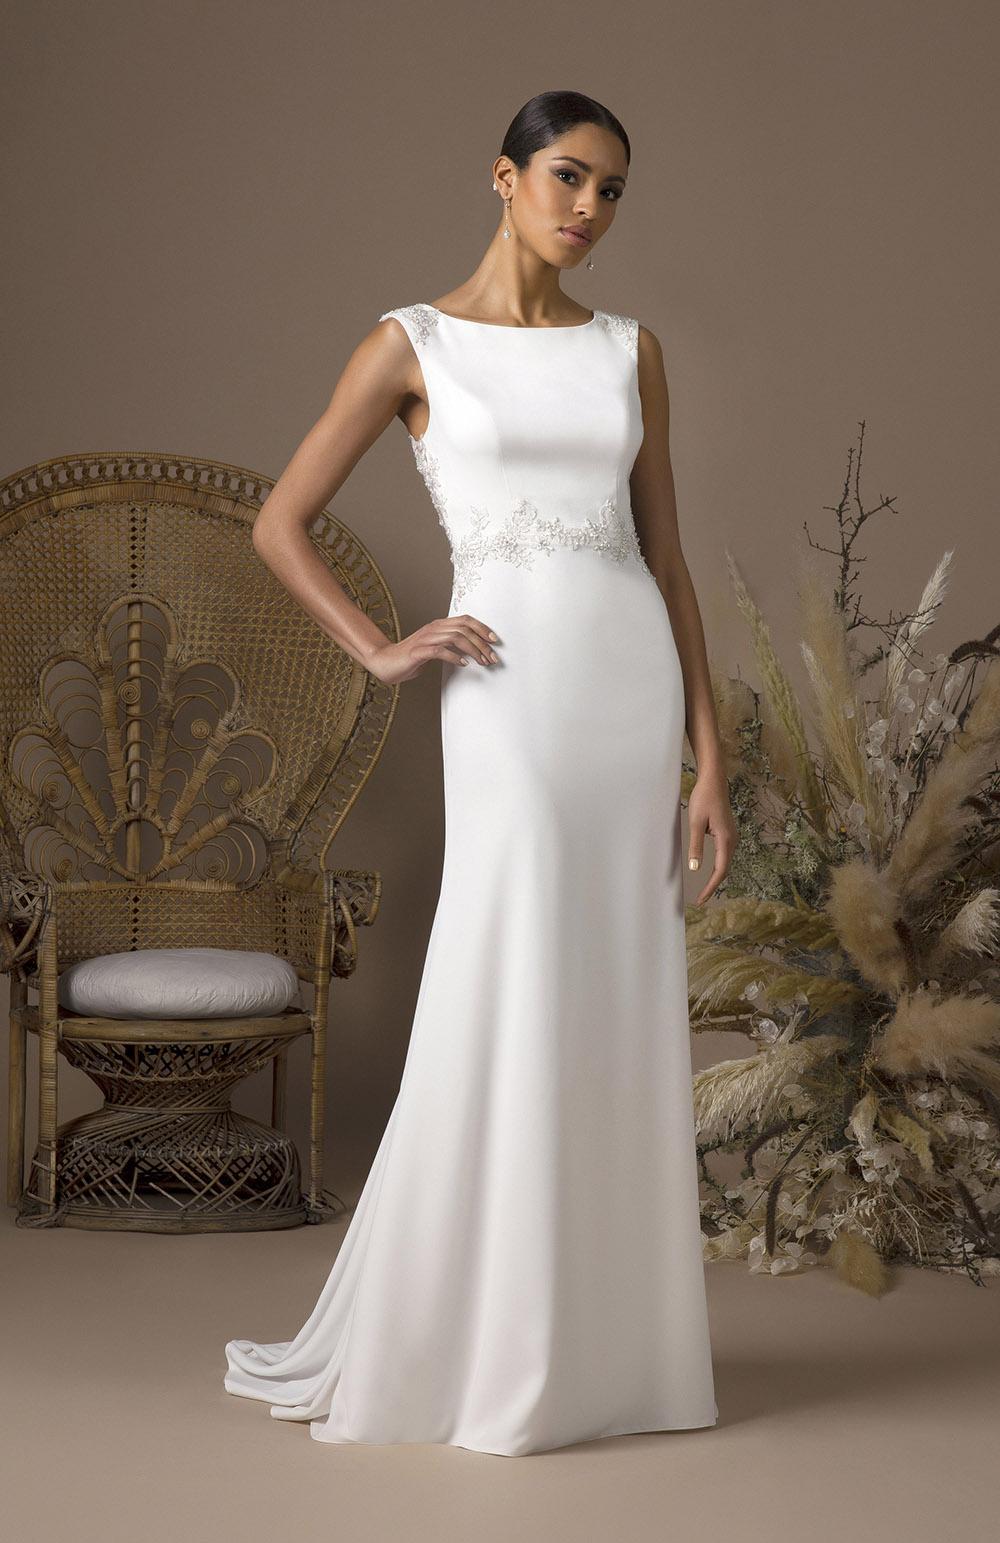 Robe de mariée Modèle Danitza